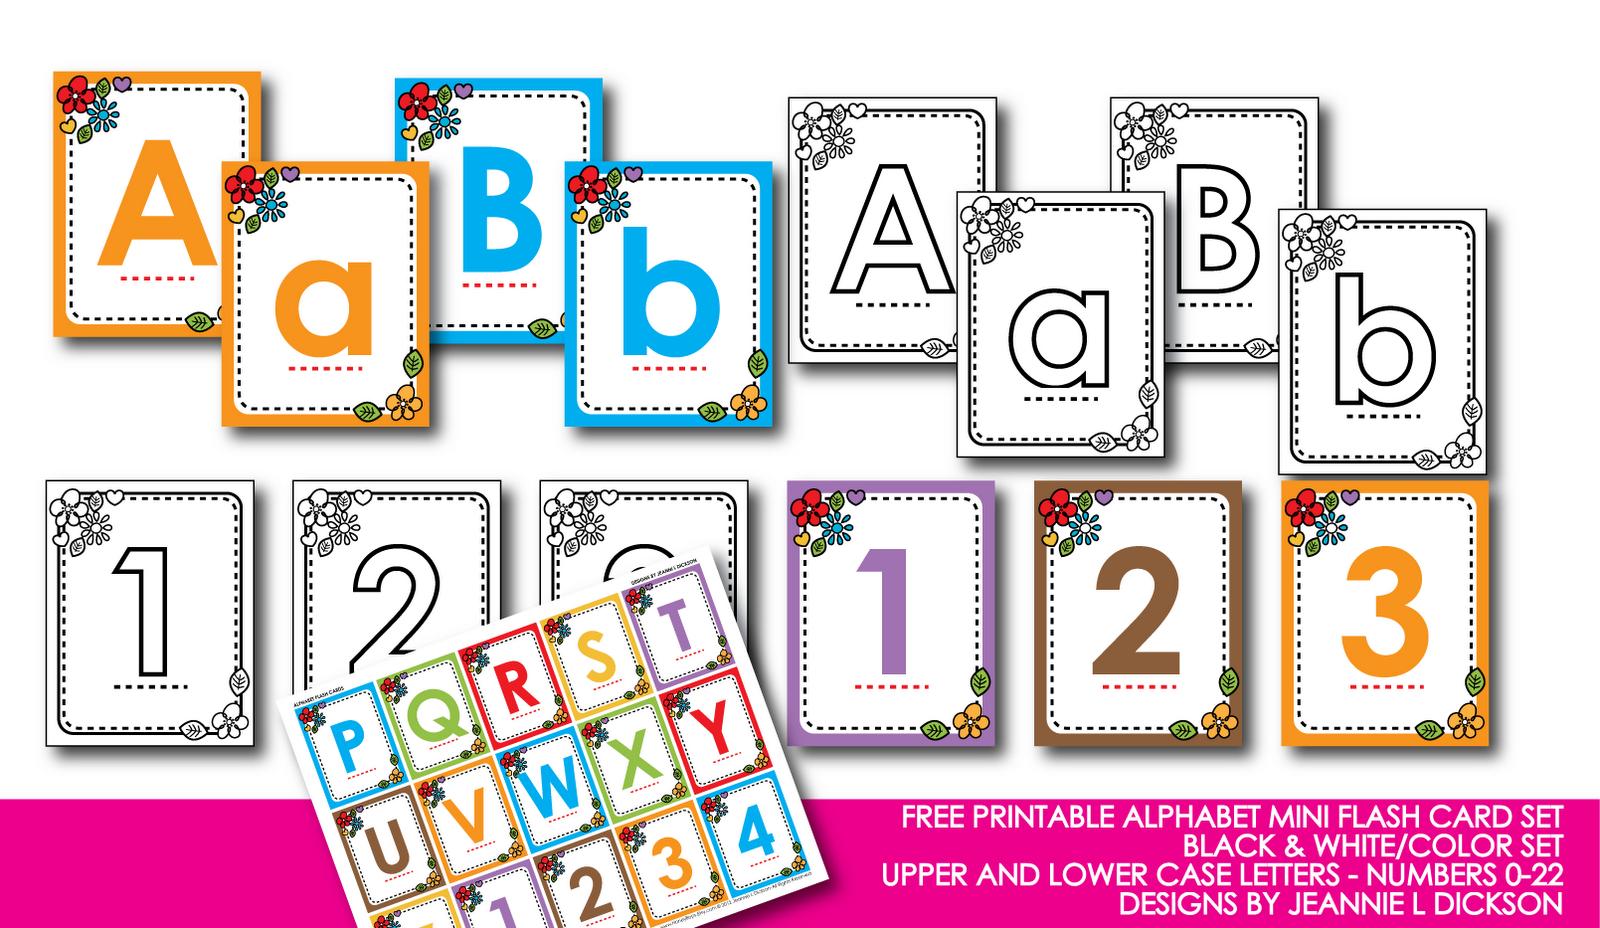 Kindergarten Alphabet Cards | Free Printable Alphabet Mini Flash - Free Printable Alphabet Letters For Display